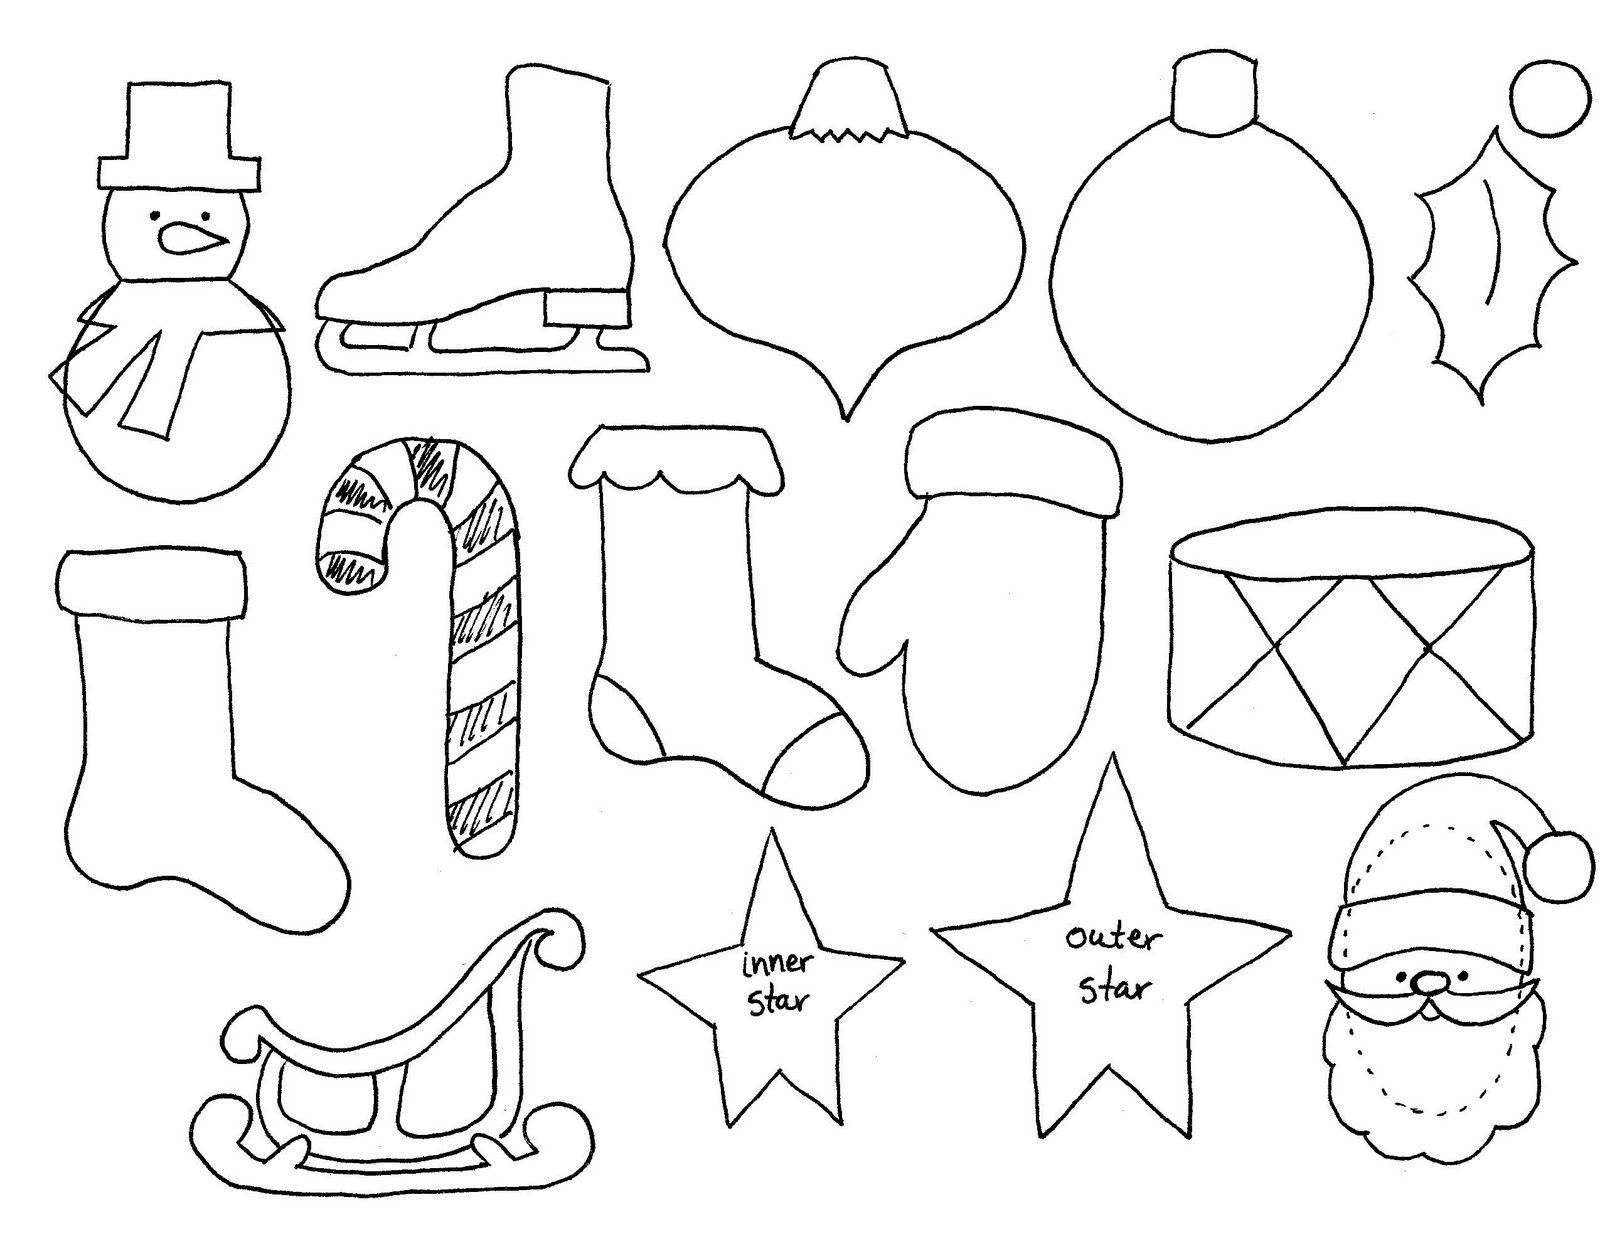 Free Printable Christmas Decoration Templates   Natal   Christmas - Free Printable Christmas Ornament Patterns